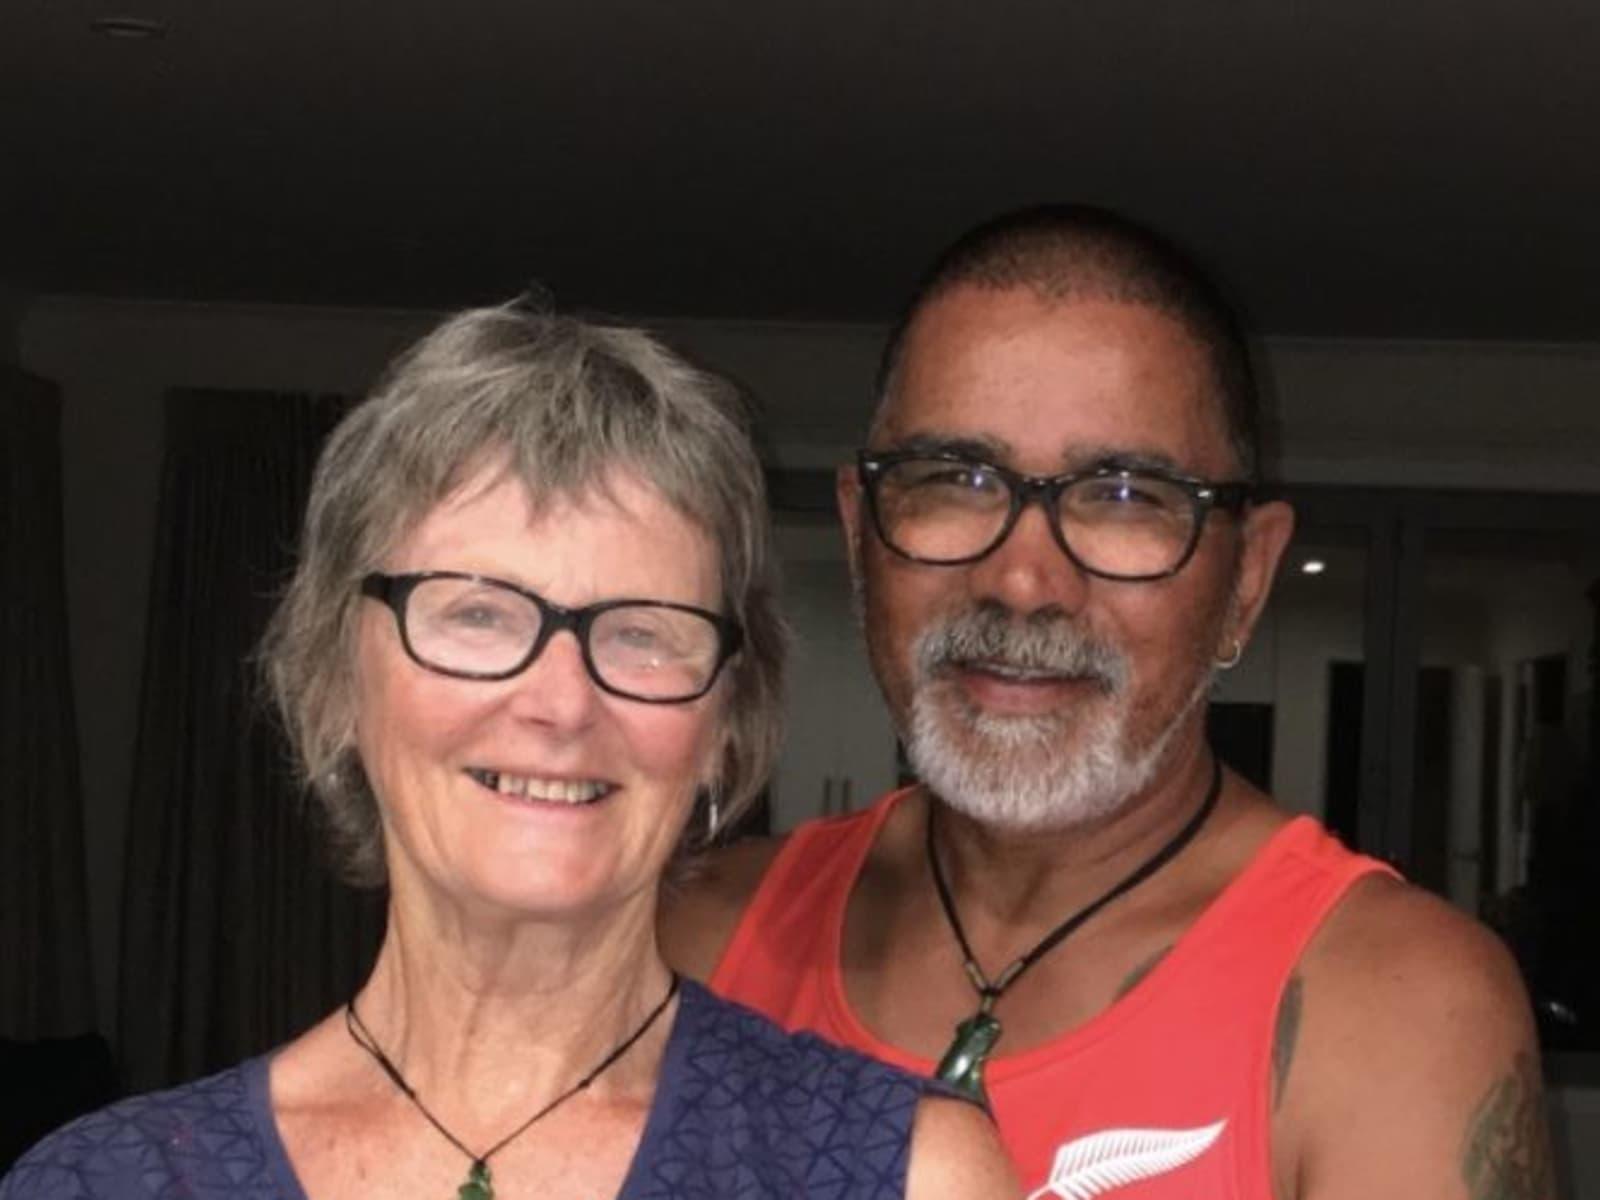 Jude & Shane from Winton, New Zealand